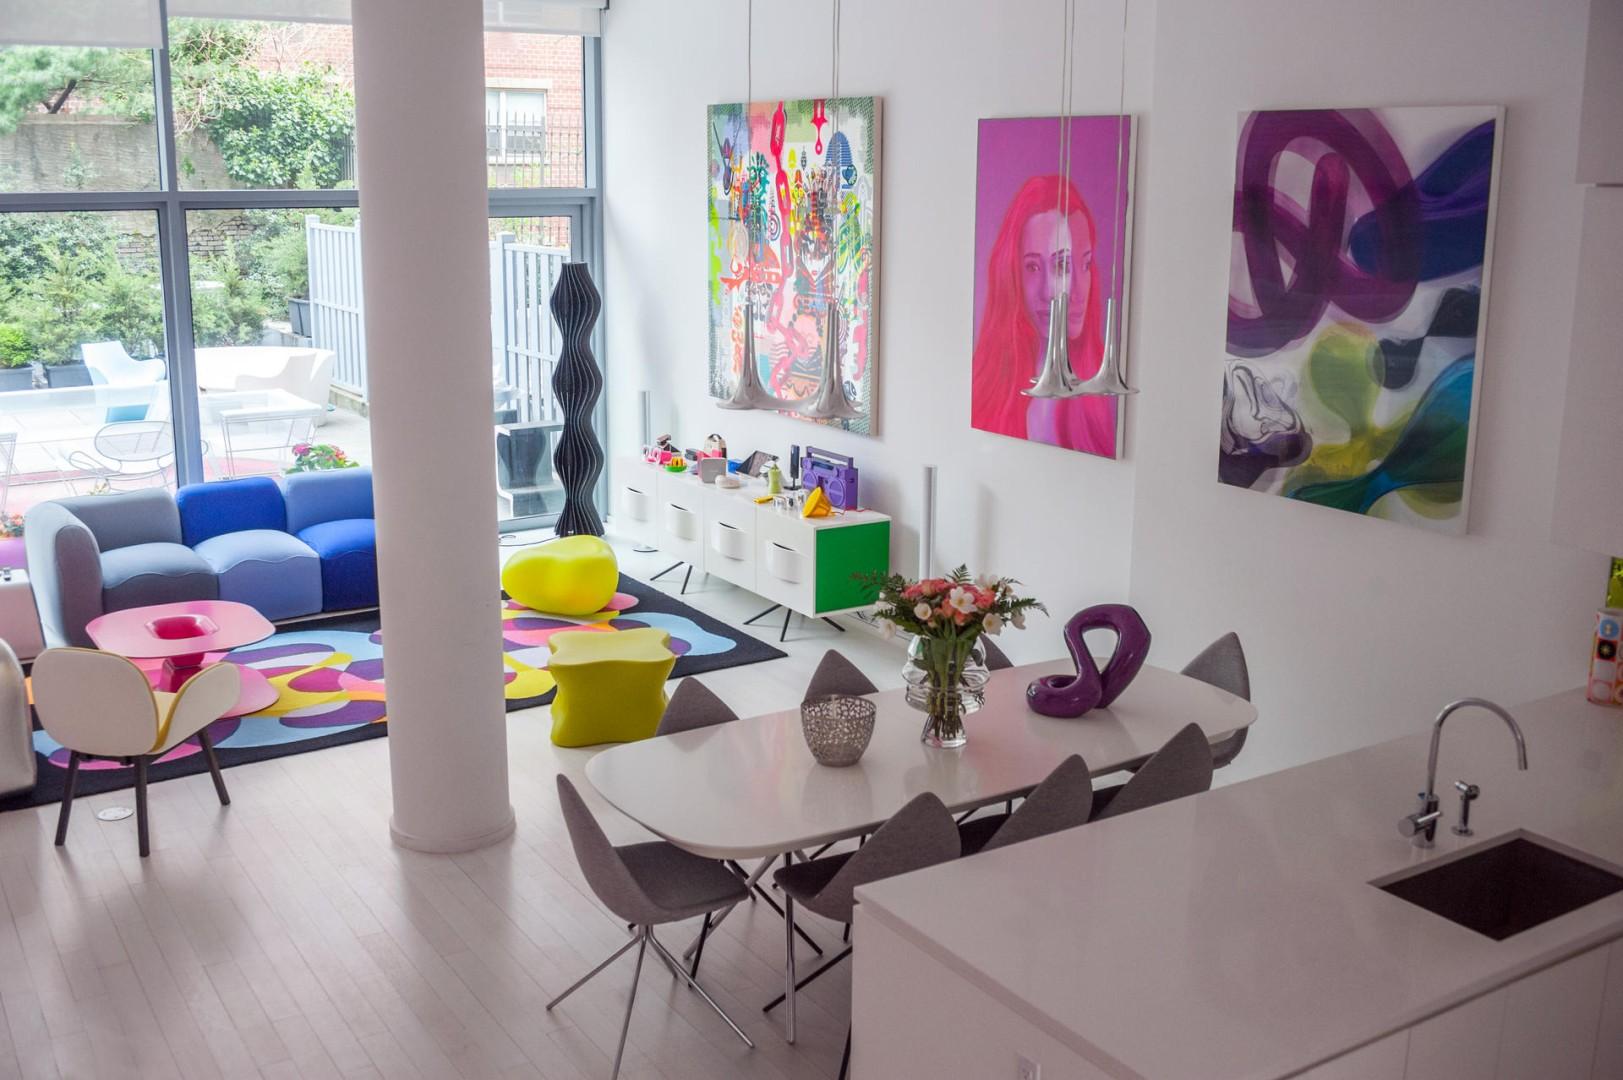 Bo Concept La Garde karim rashid's new home is fun yet practical | south china